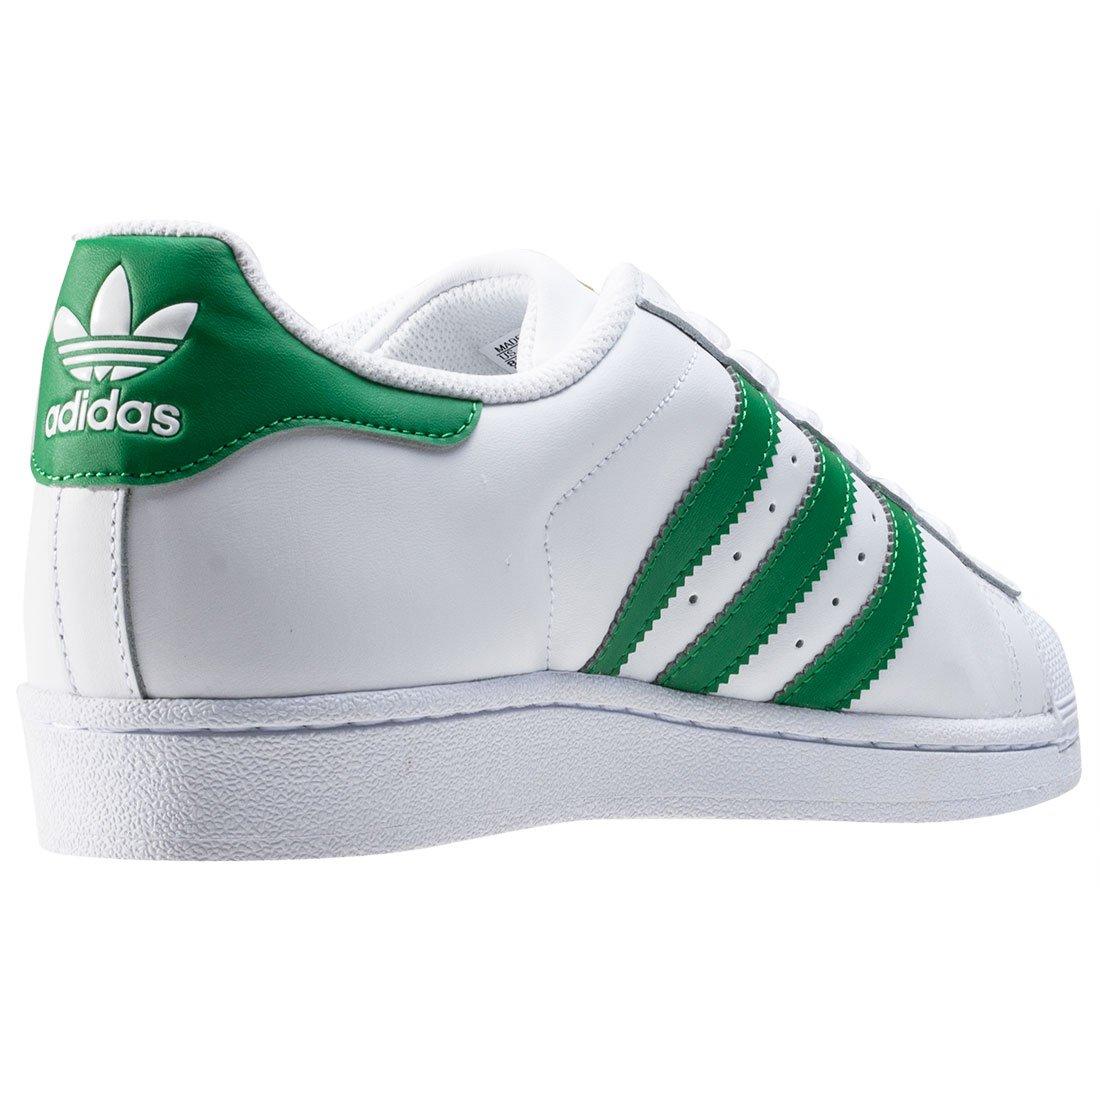 f26af3251b8bcc adidas Superstar Foundation - ftwwht green goldmt  Amazon.de  Sport    Freizeit